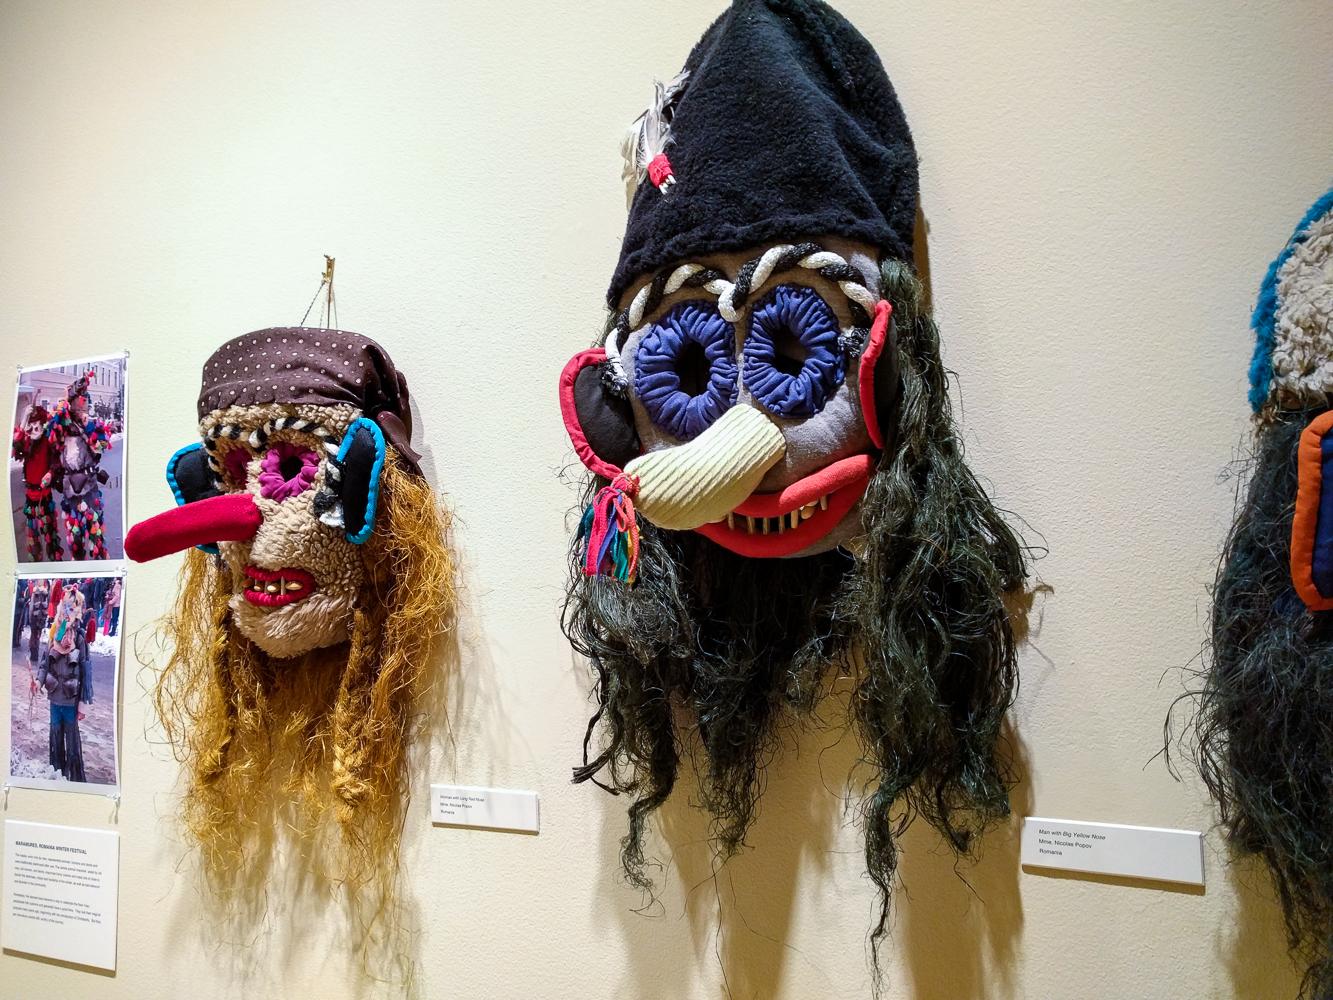 Maramure Winter Festival masks, Romania